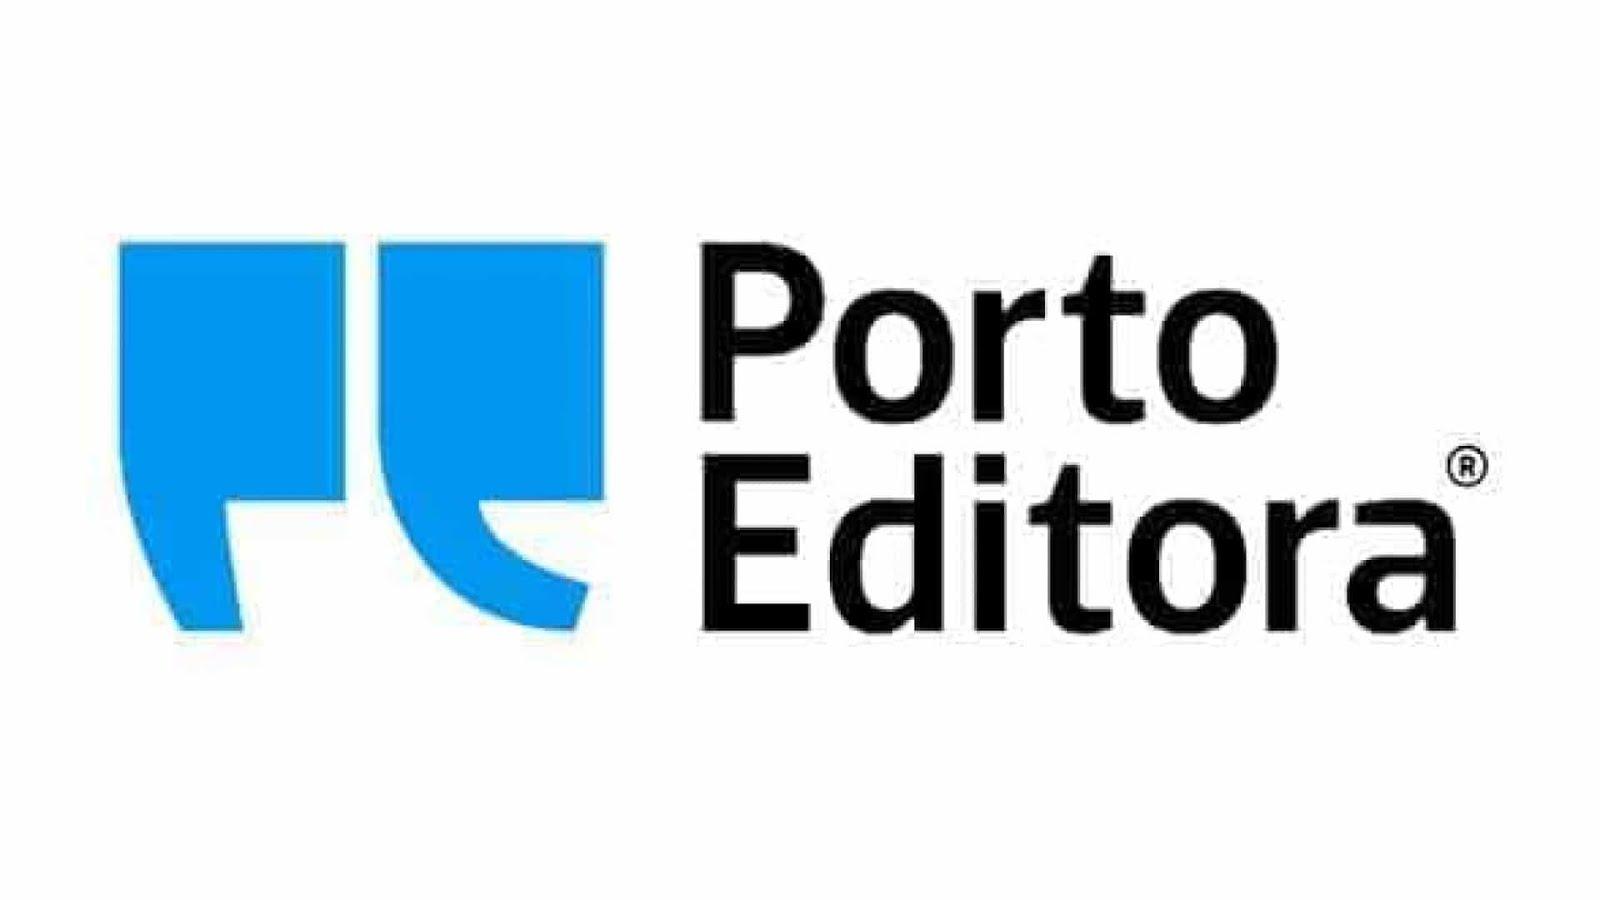 Parceria Porto Editora